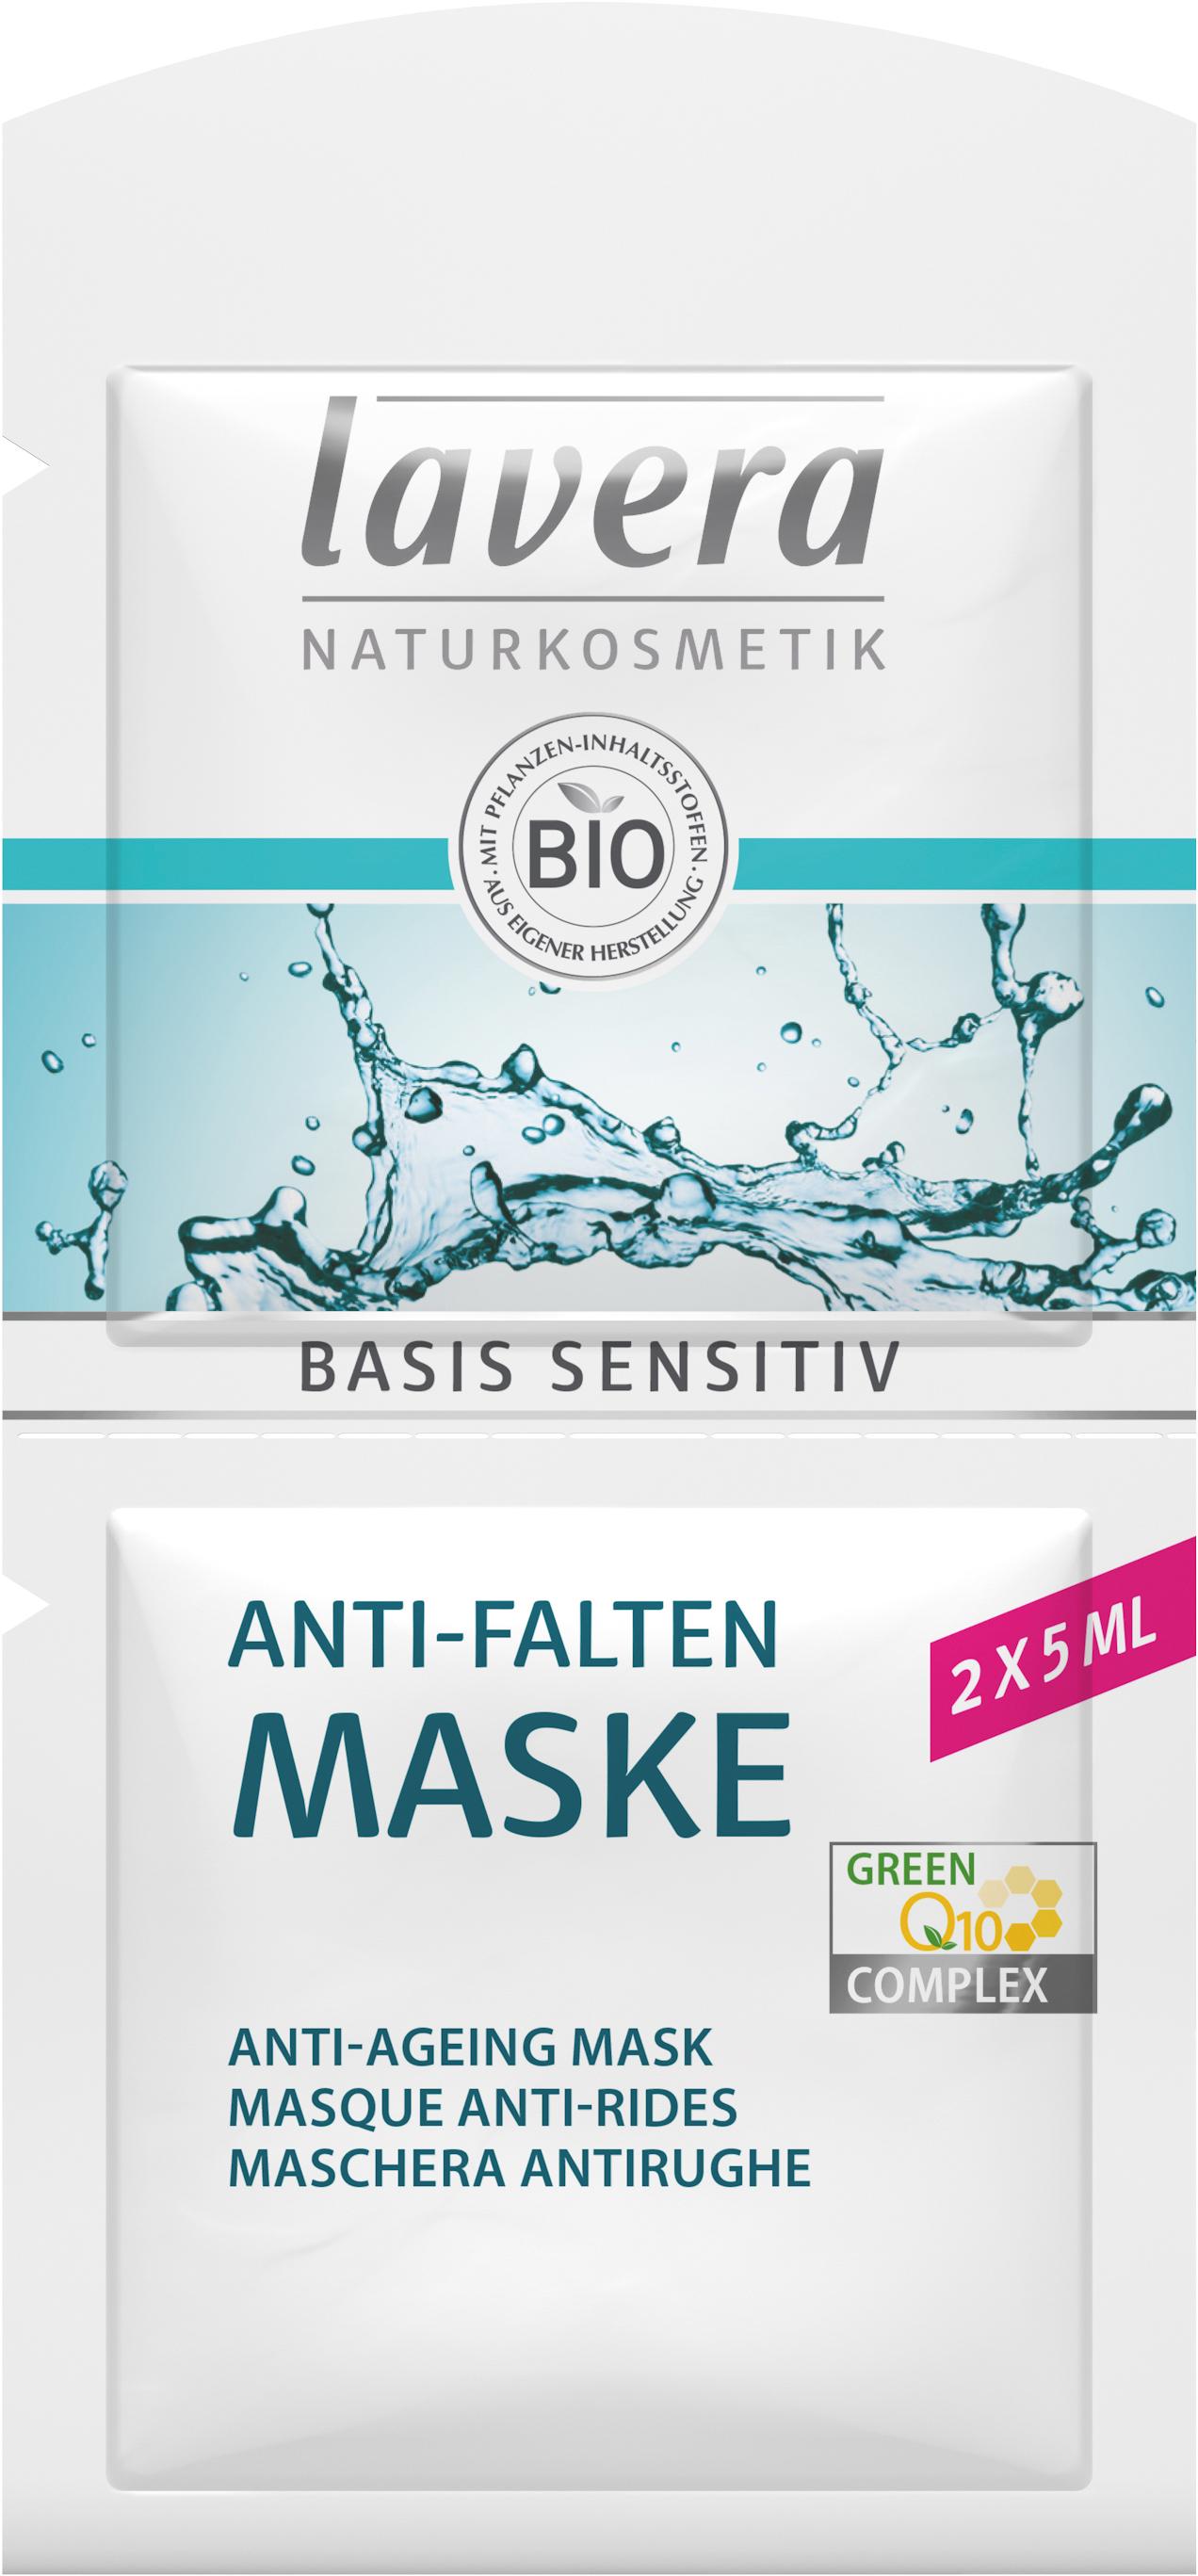 basis sensitiv Masque anti-rides Q10